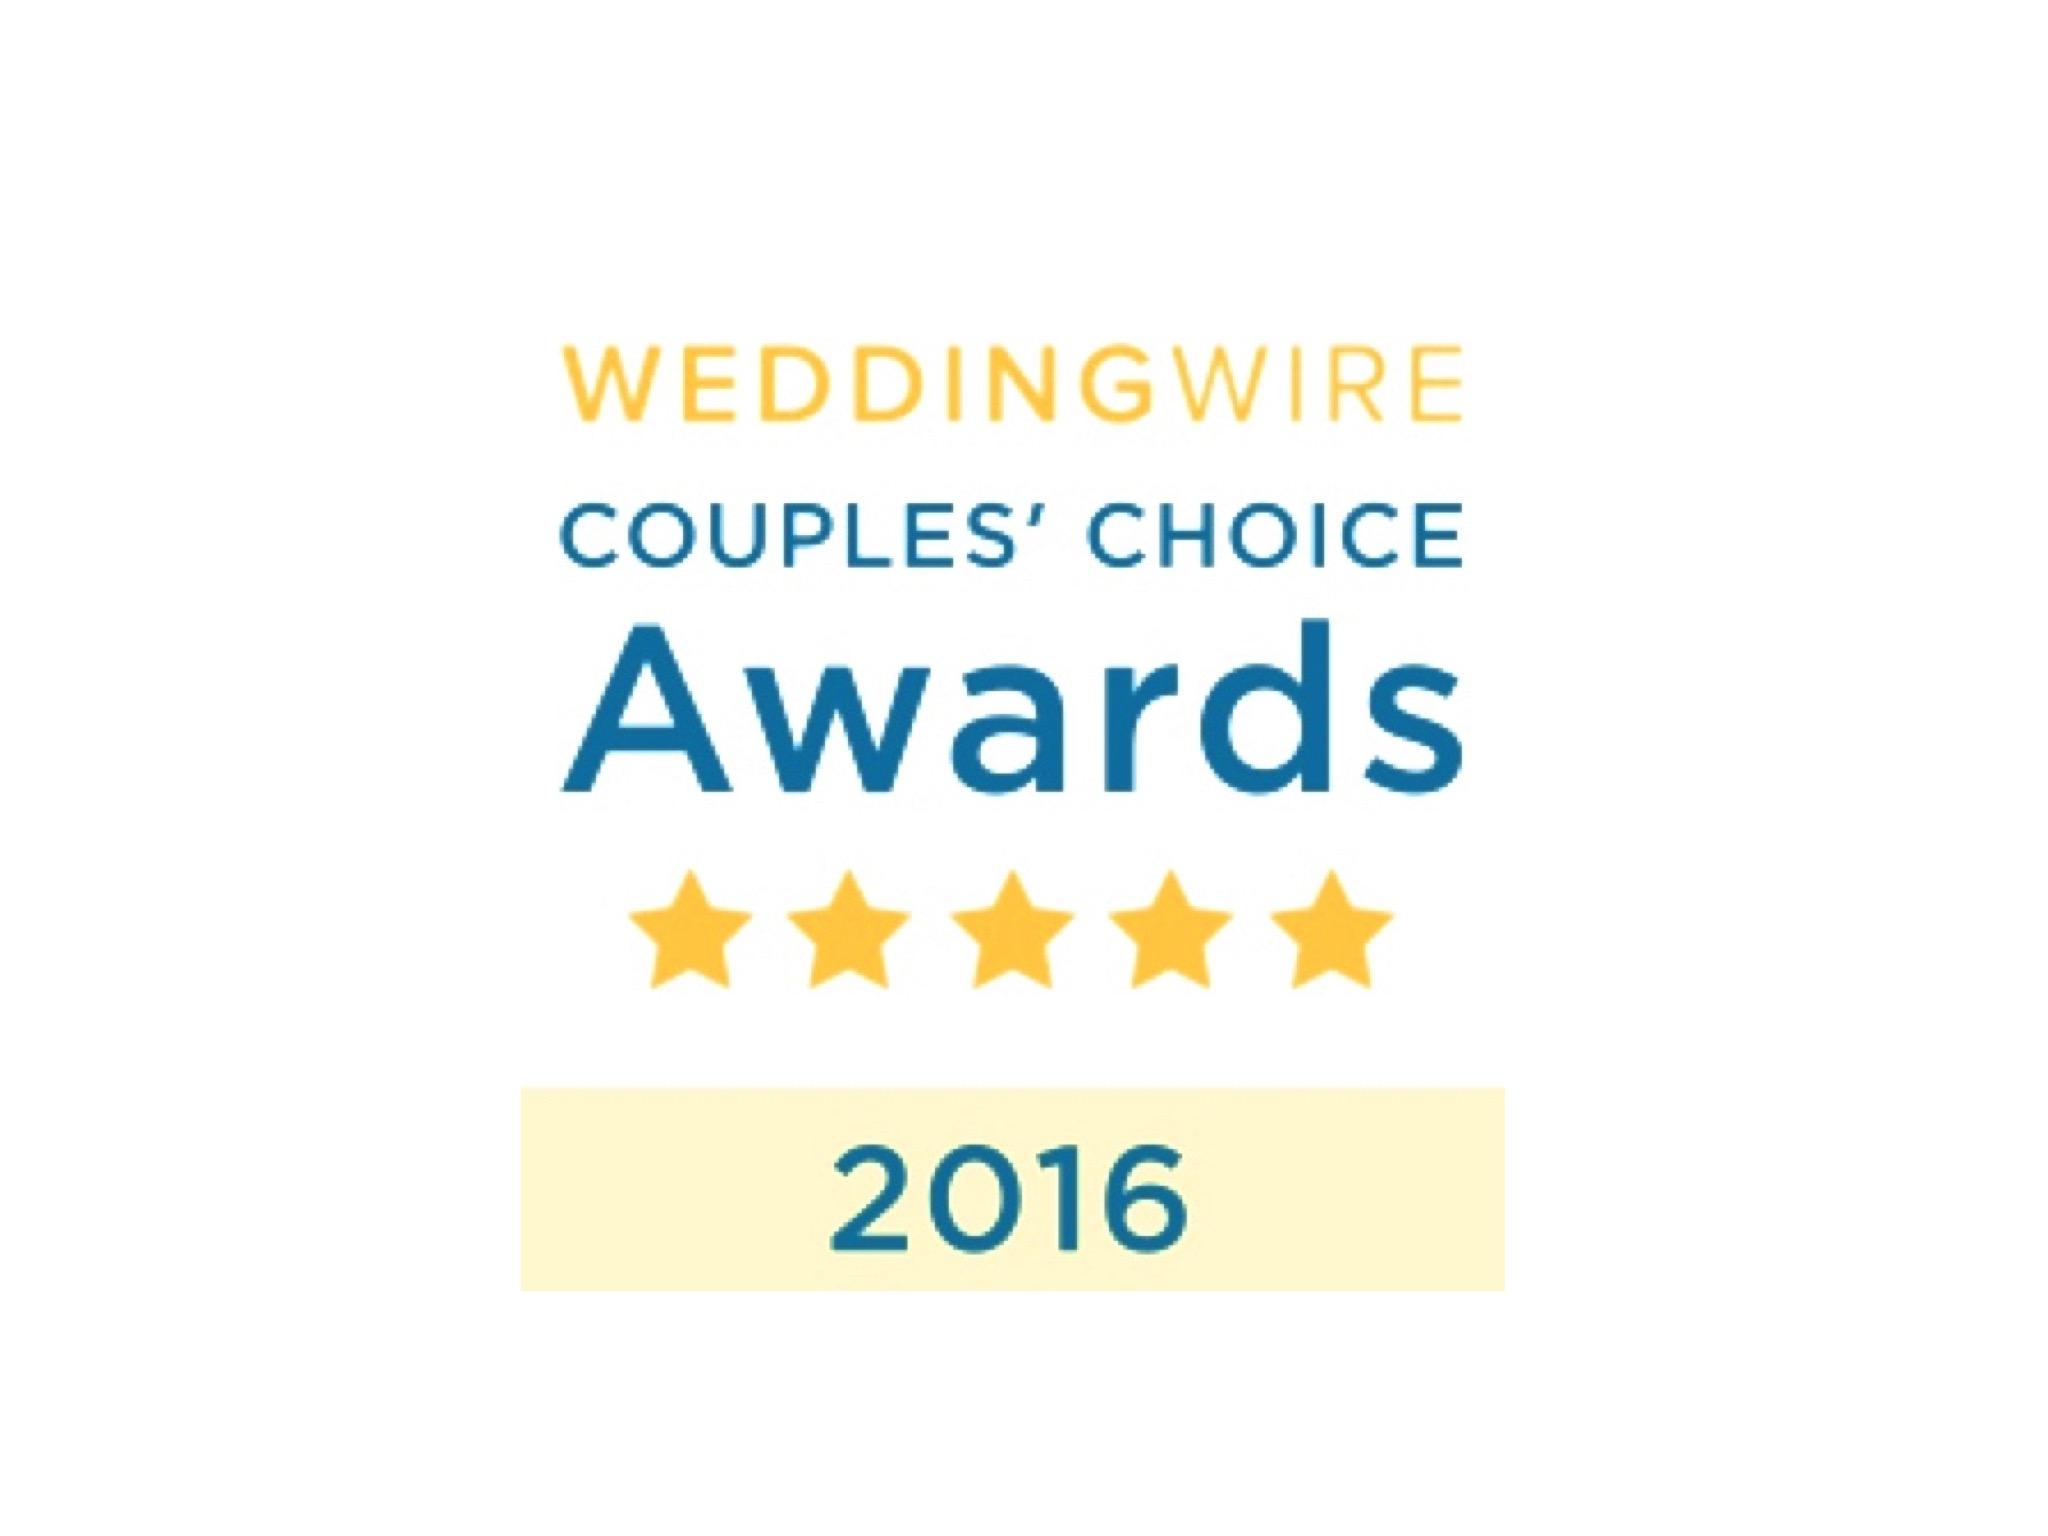 Savvy Treats, wedding wire, wedding, cake, cupcakes, MD, VA, DC, delivery